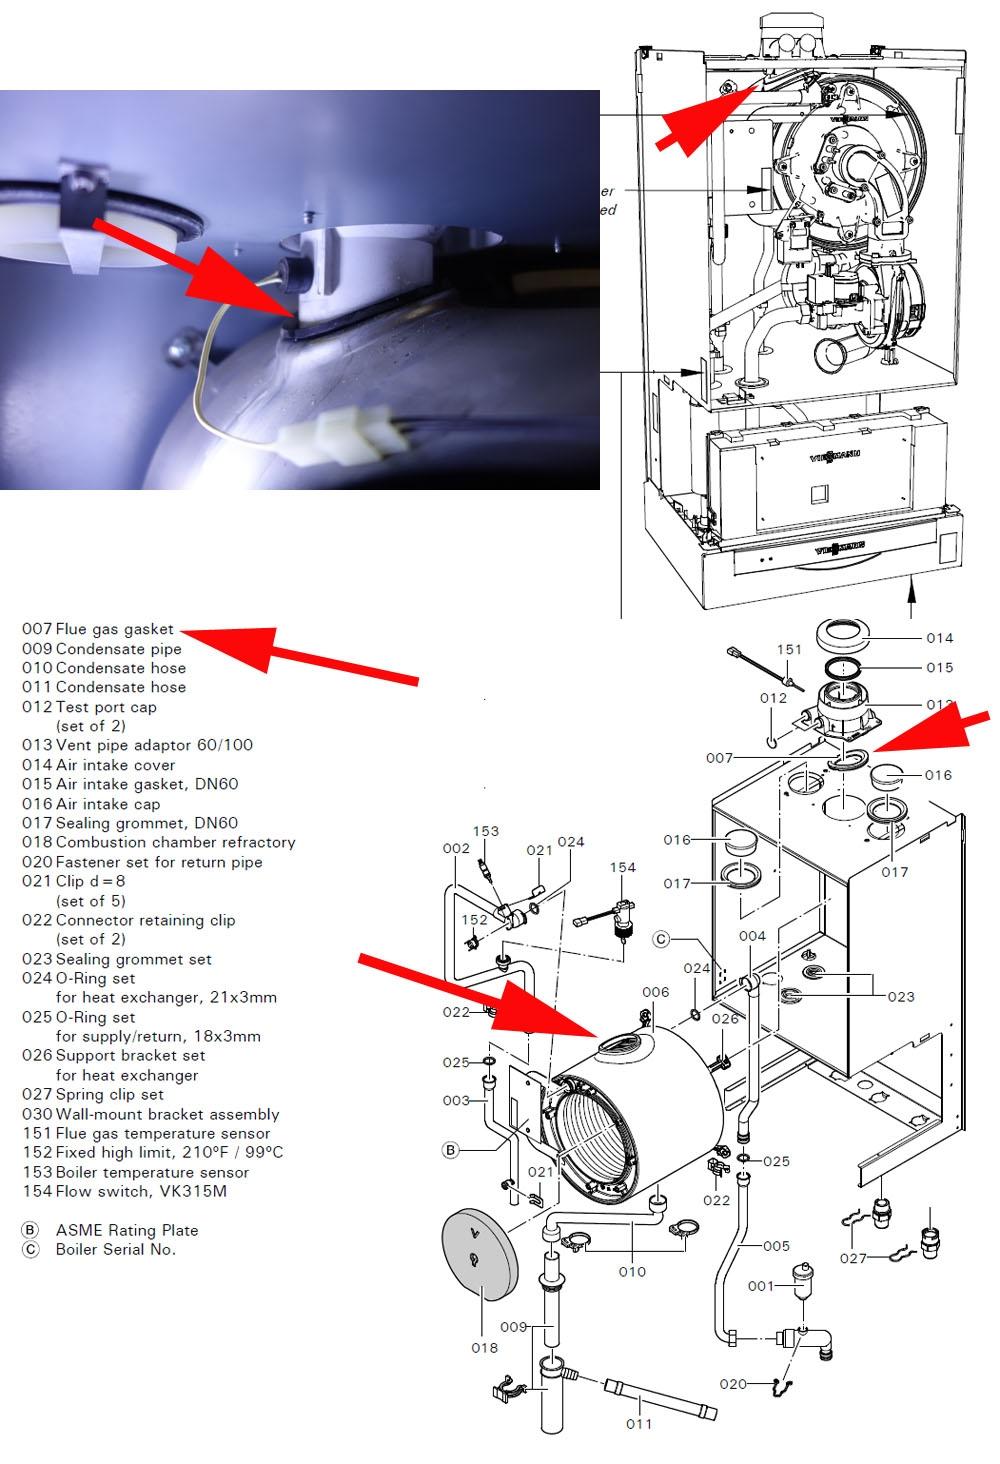 Viessmann Vitodens 200 W Wb2b Condensate Seeping Thru Flue Gas Gasket Heating Help The Wall